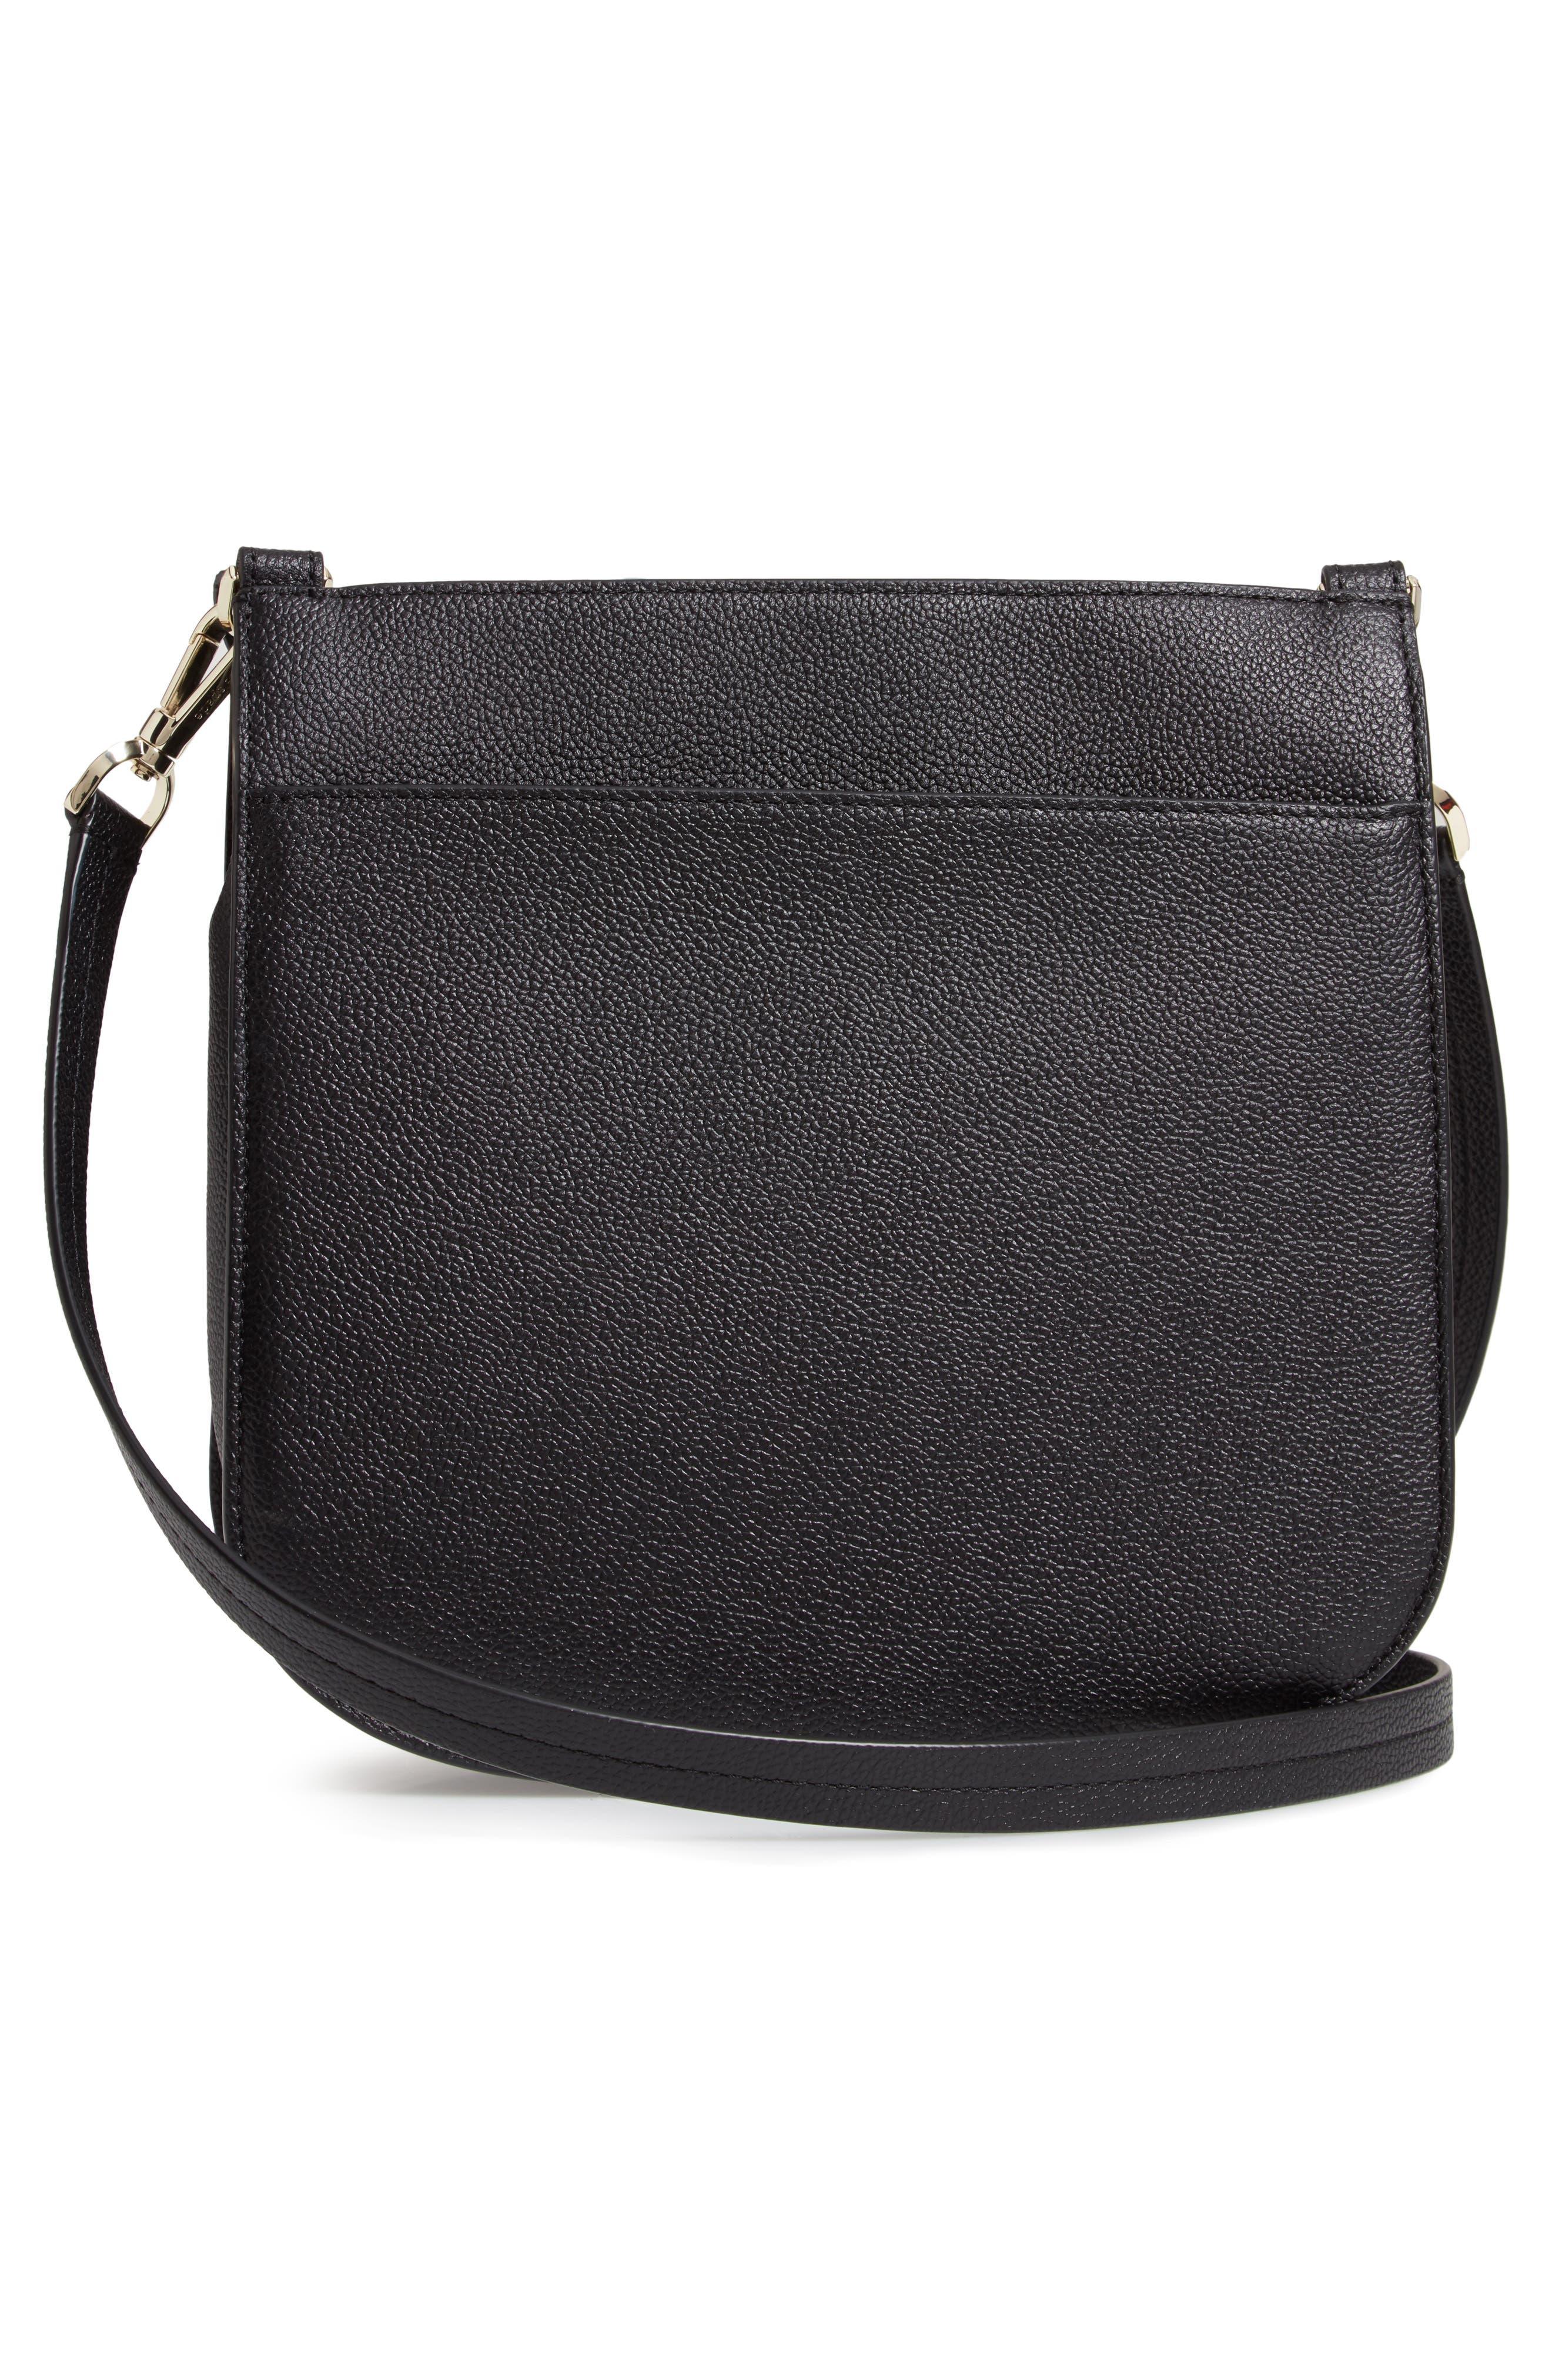 KATE SPADE NEW YORK,                             margaux large crossbody bag,                             Alternate thumbnail 3, color,                             BLACK